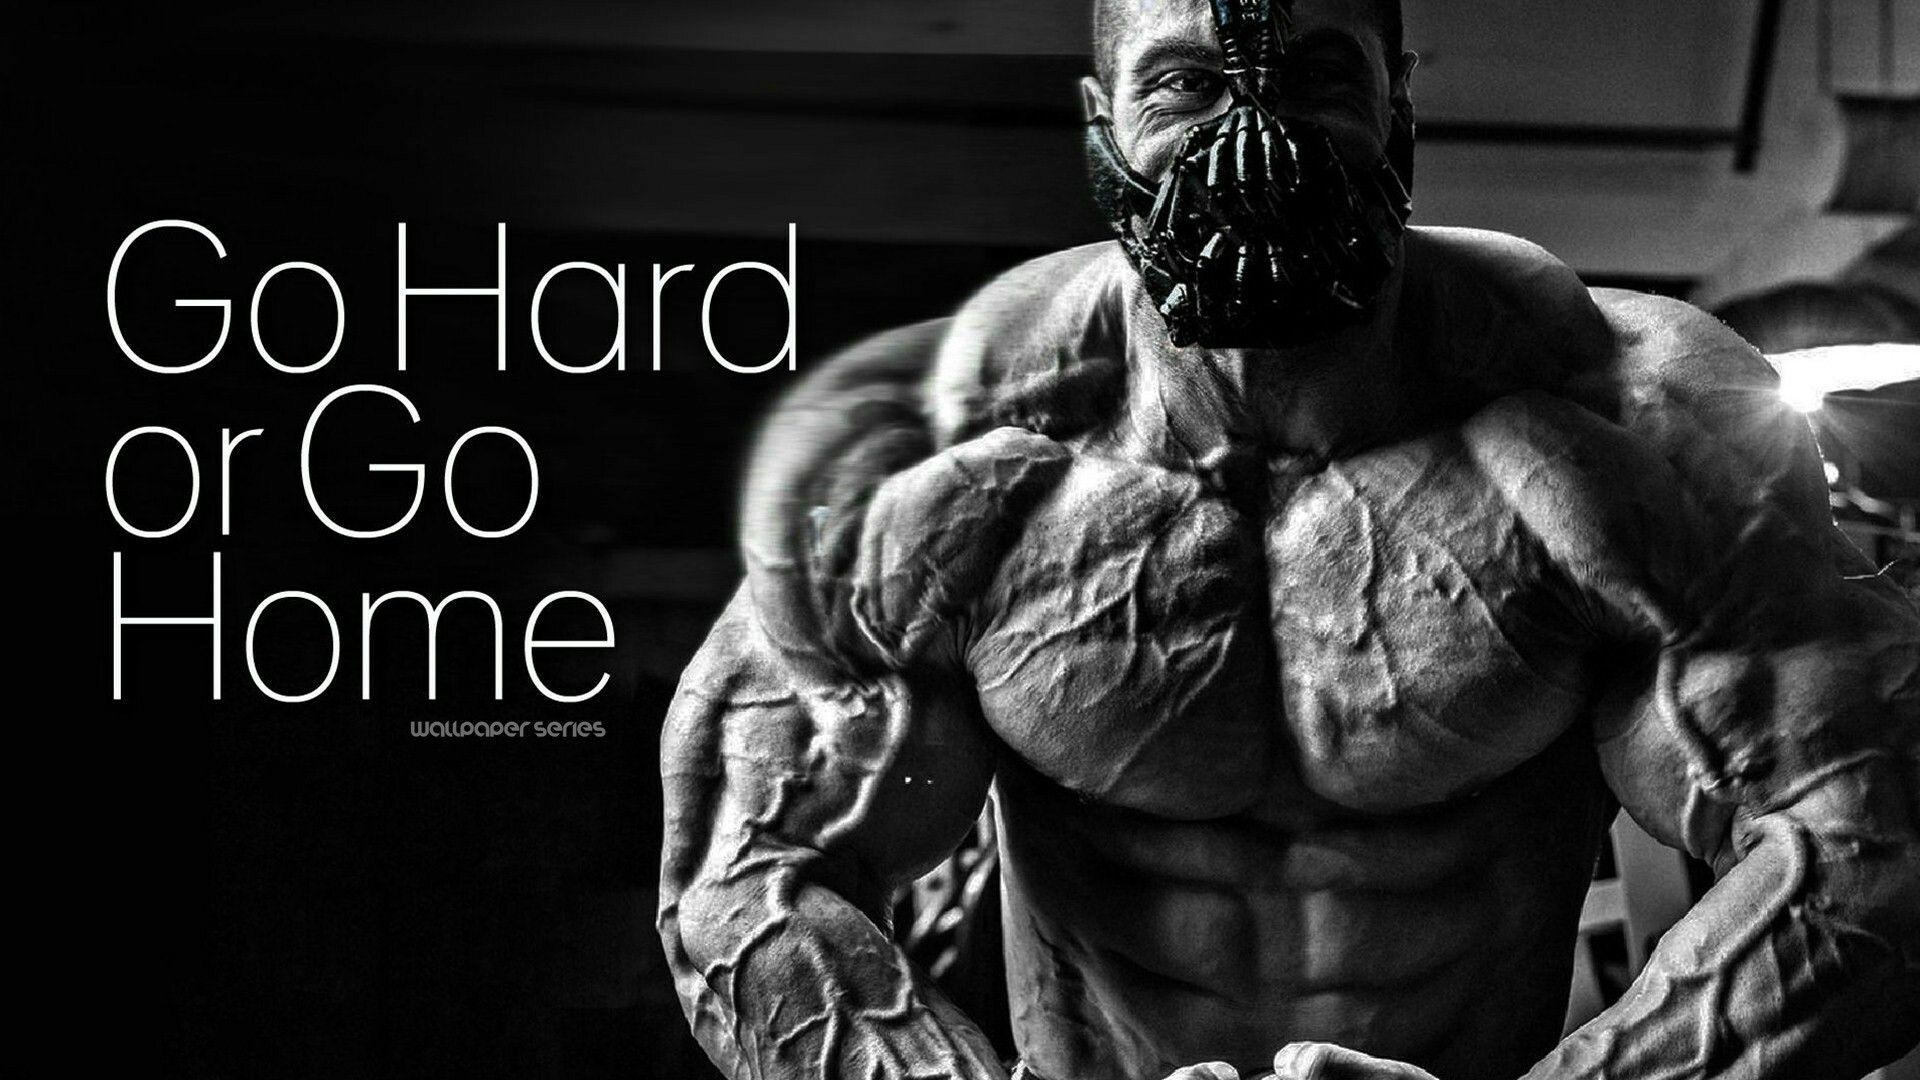 Go Hard Exercise Gym Gym Motivation Wallpaper Workout